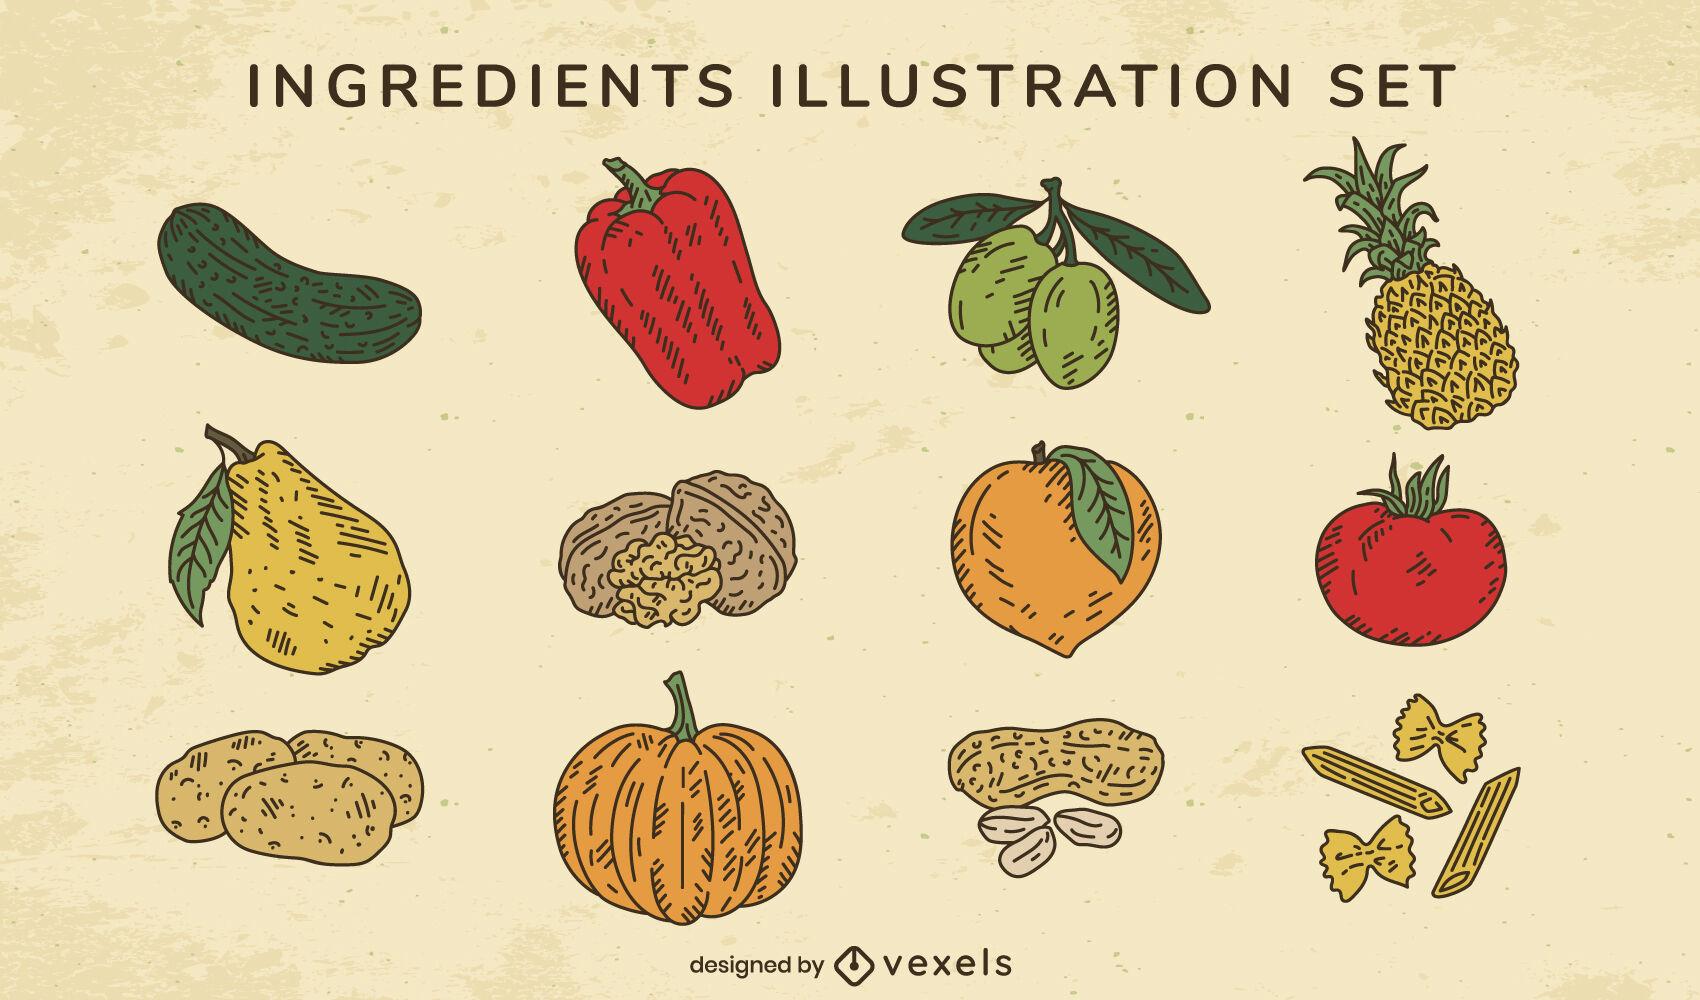 Vegetables and fruits cooking ingredients set